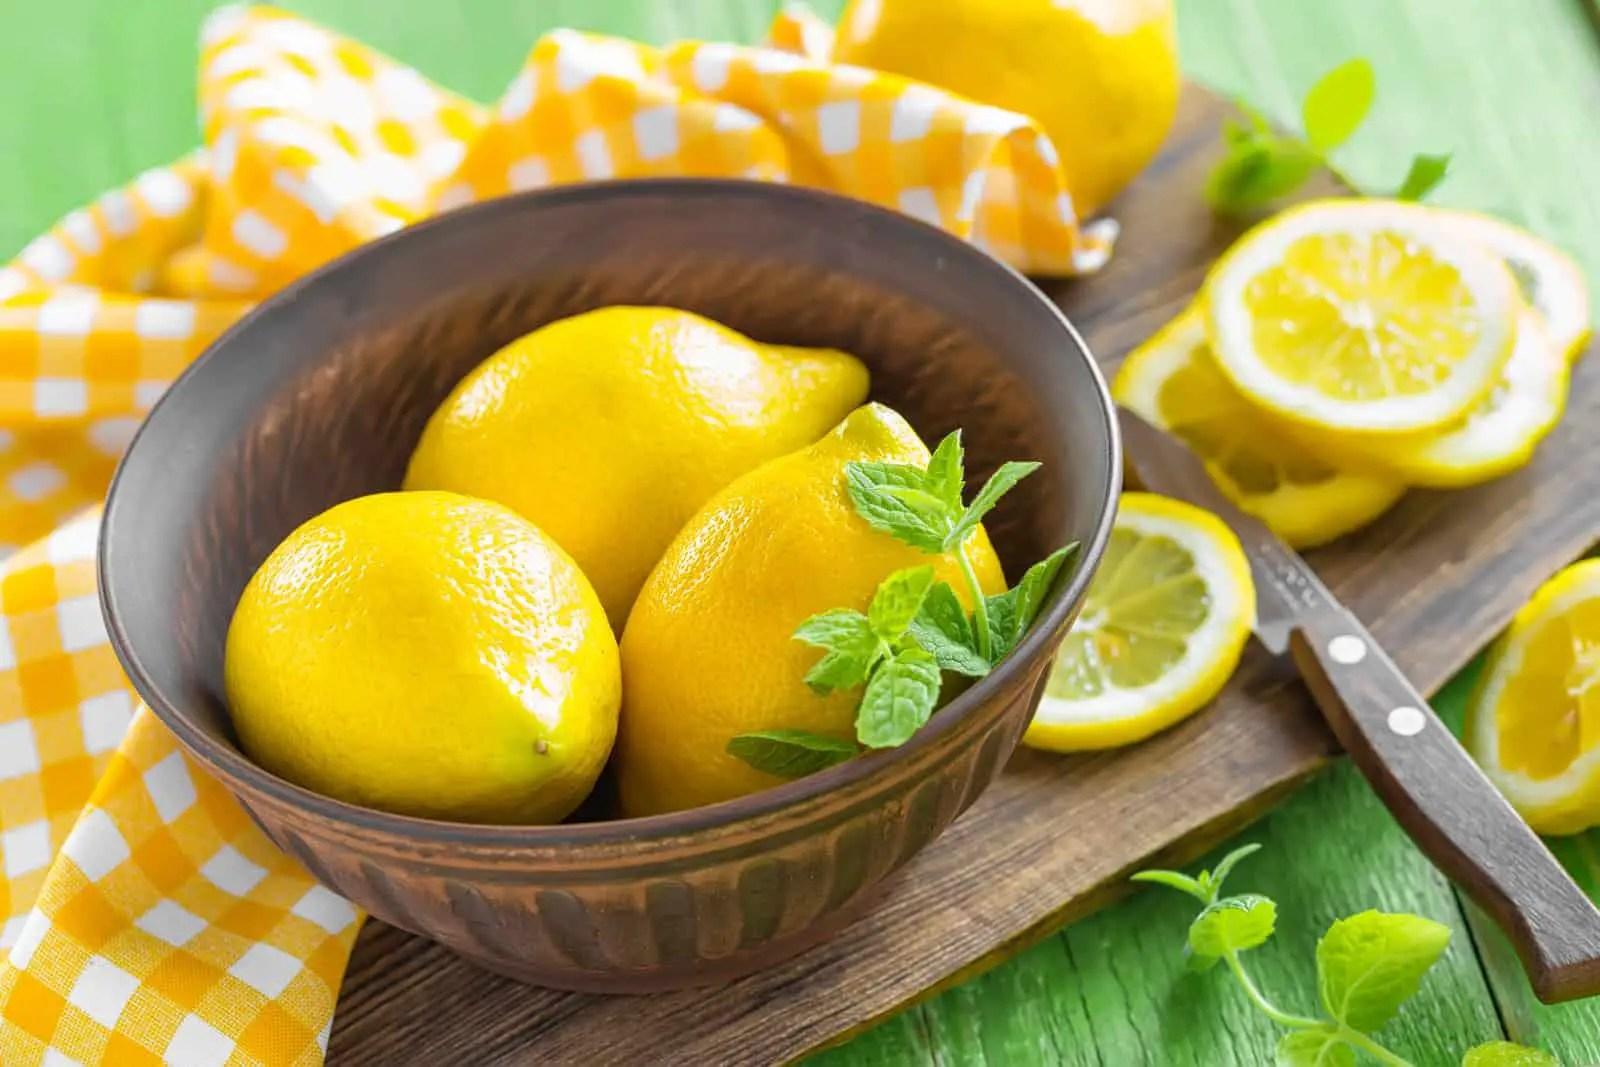 How Long Until Lemons Go Bad?